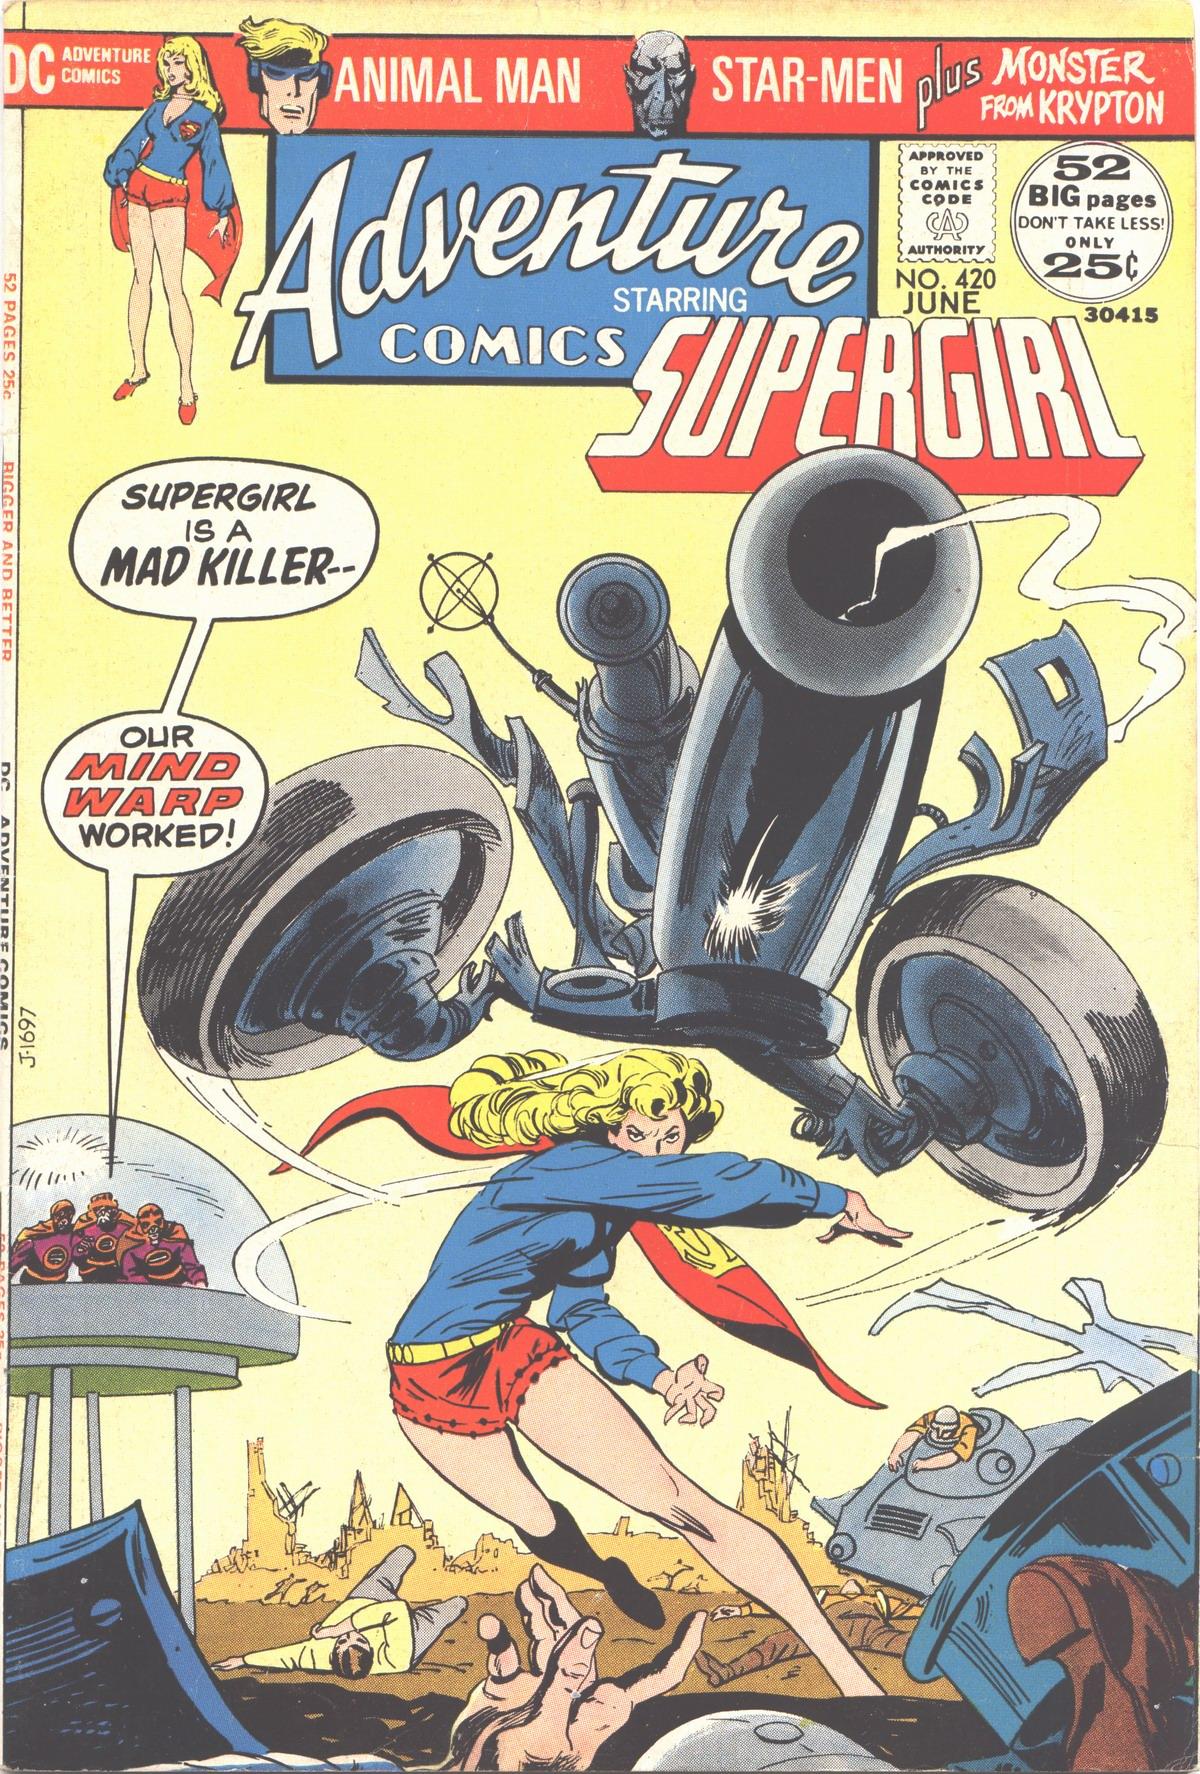 Read online Adventure Comics (1938) comic -  Issue #420 - 1